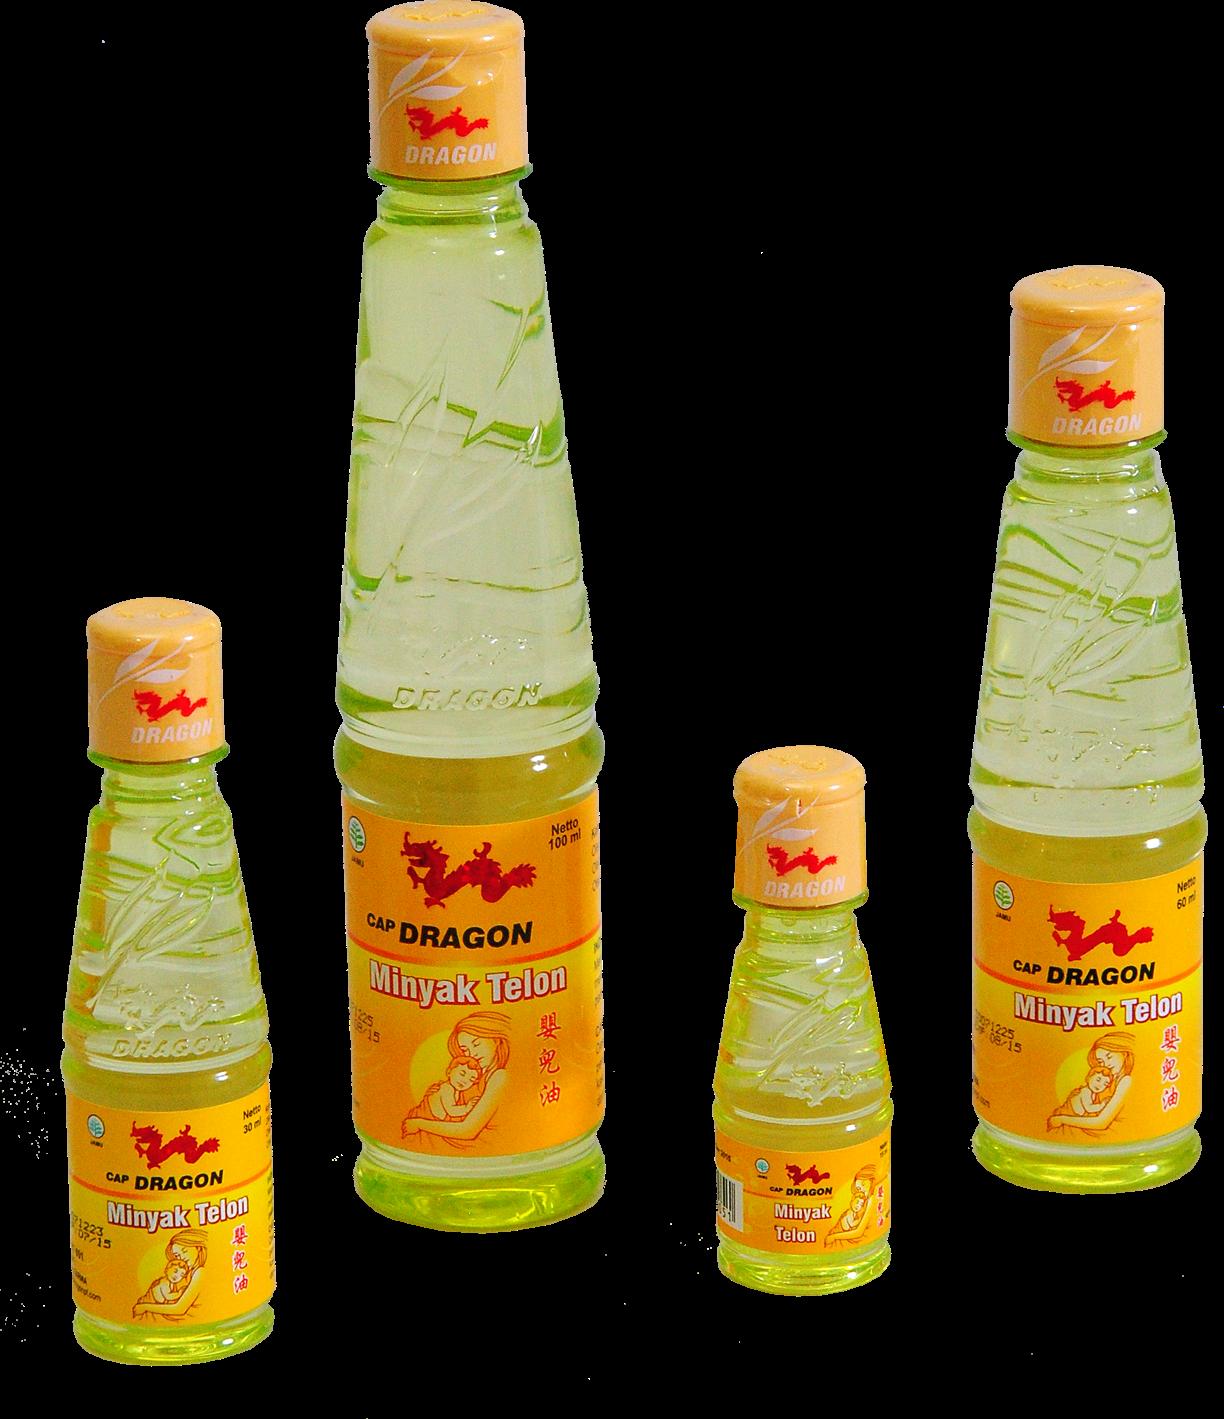 Harga Jual Minyak Kayu Putih Cap Dragon Kelebihan Kekurangan Caplang 60ml Dan 30ml Fortuna Shop Telon